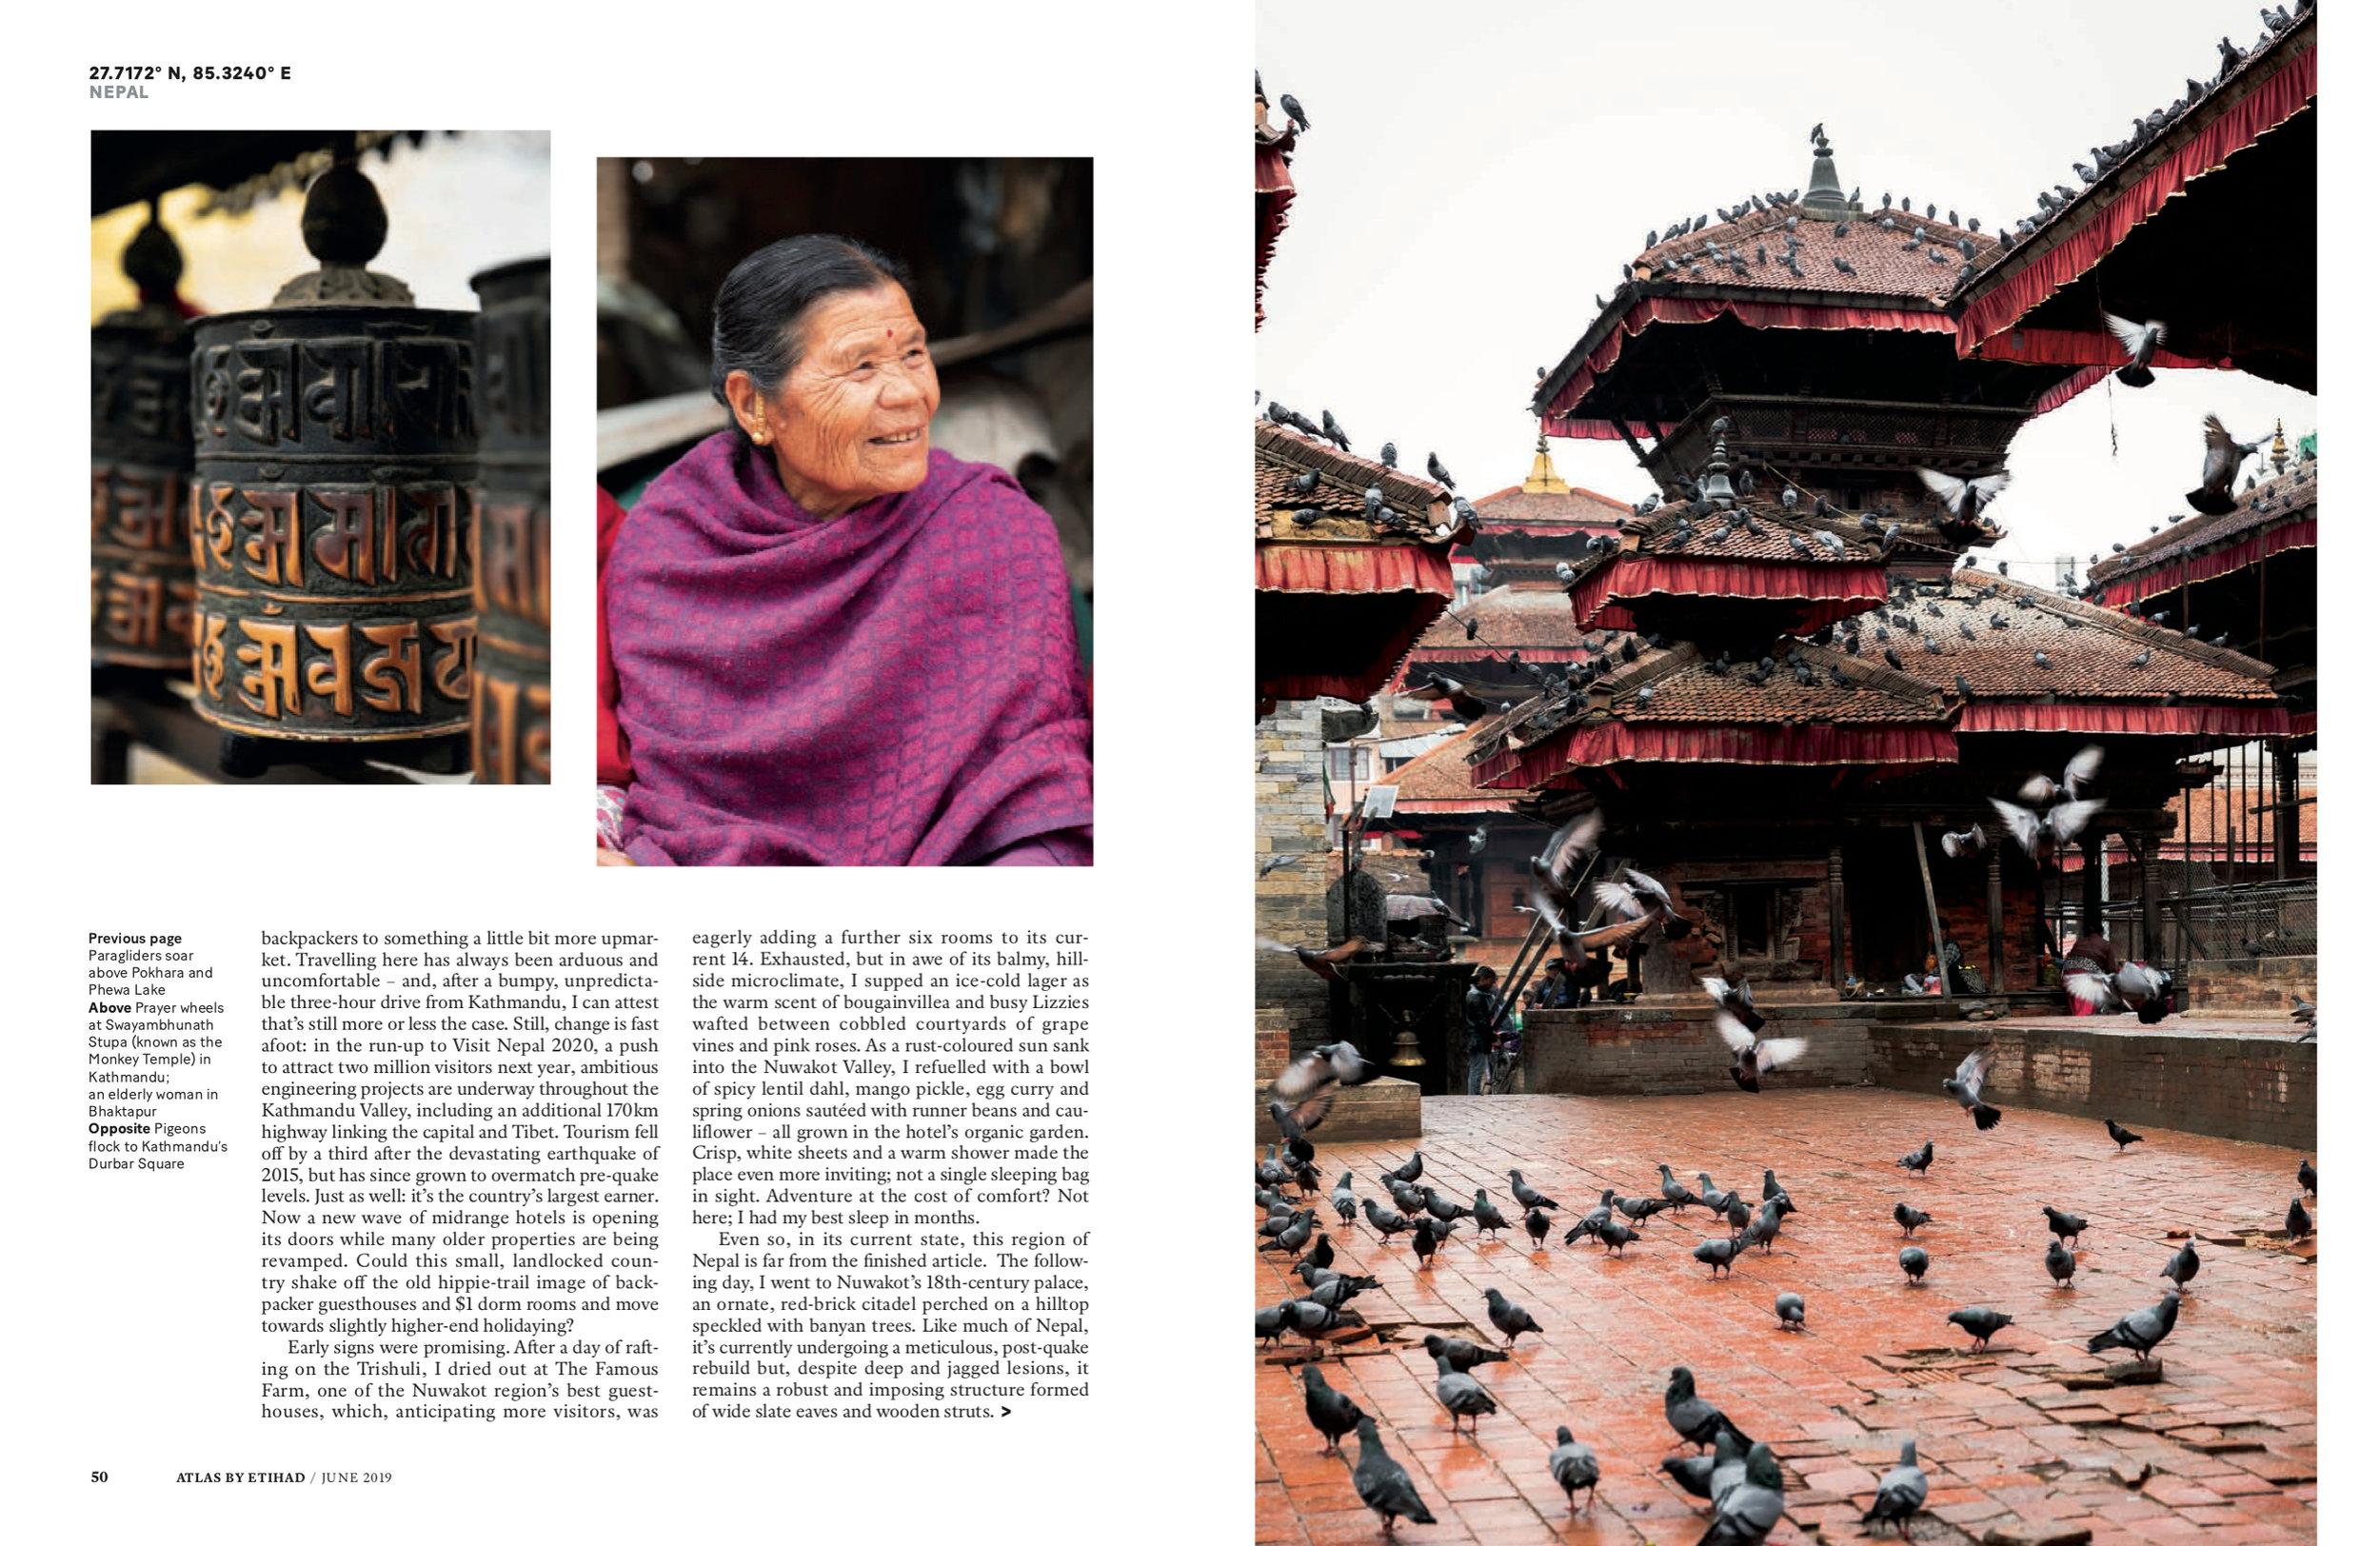 BenReadPhotography-Ink-Atlas-Etihad-Nepal-4.JPG